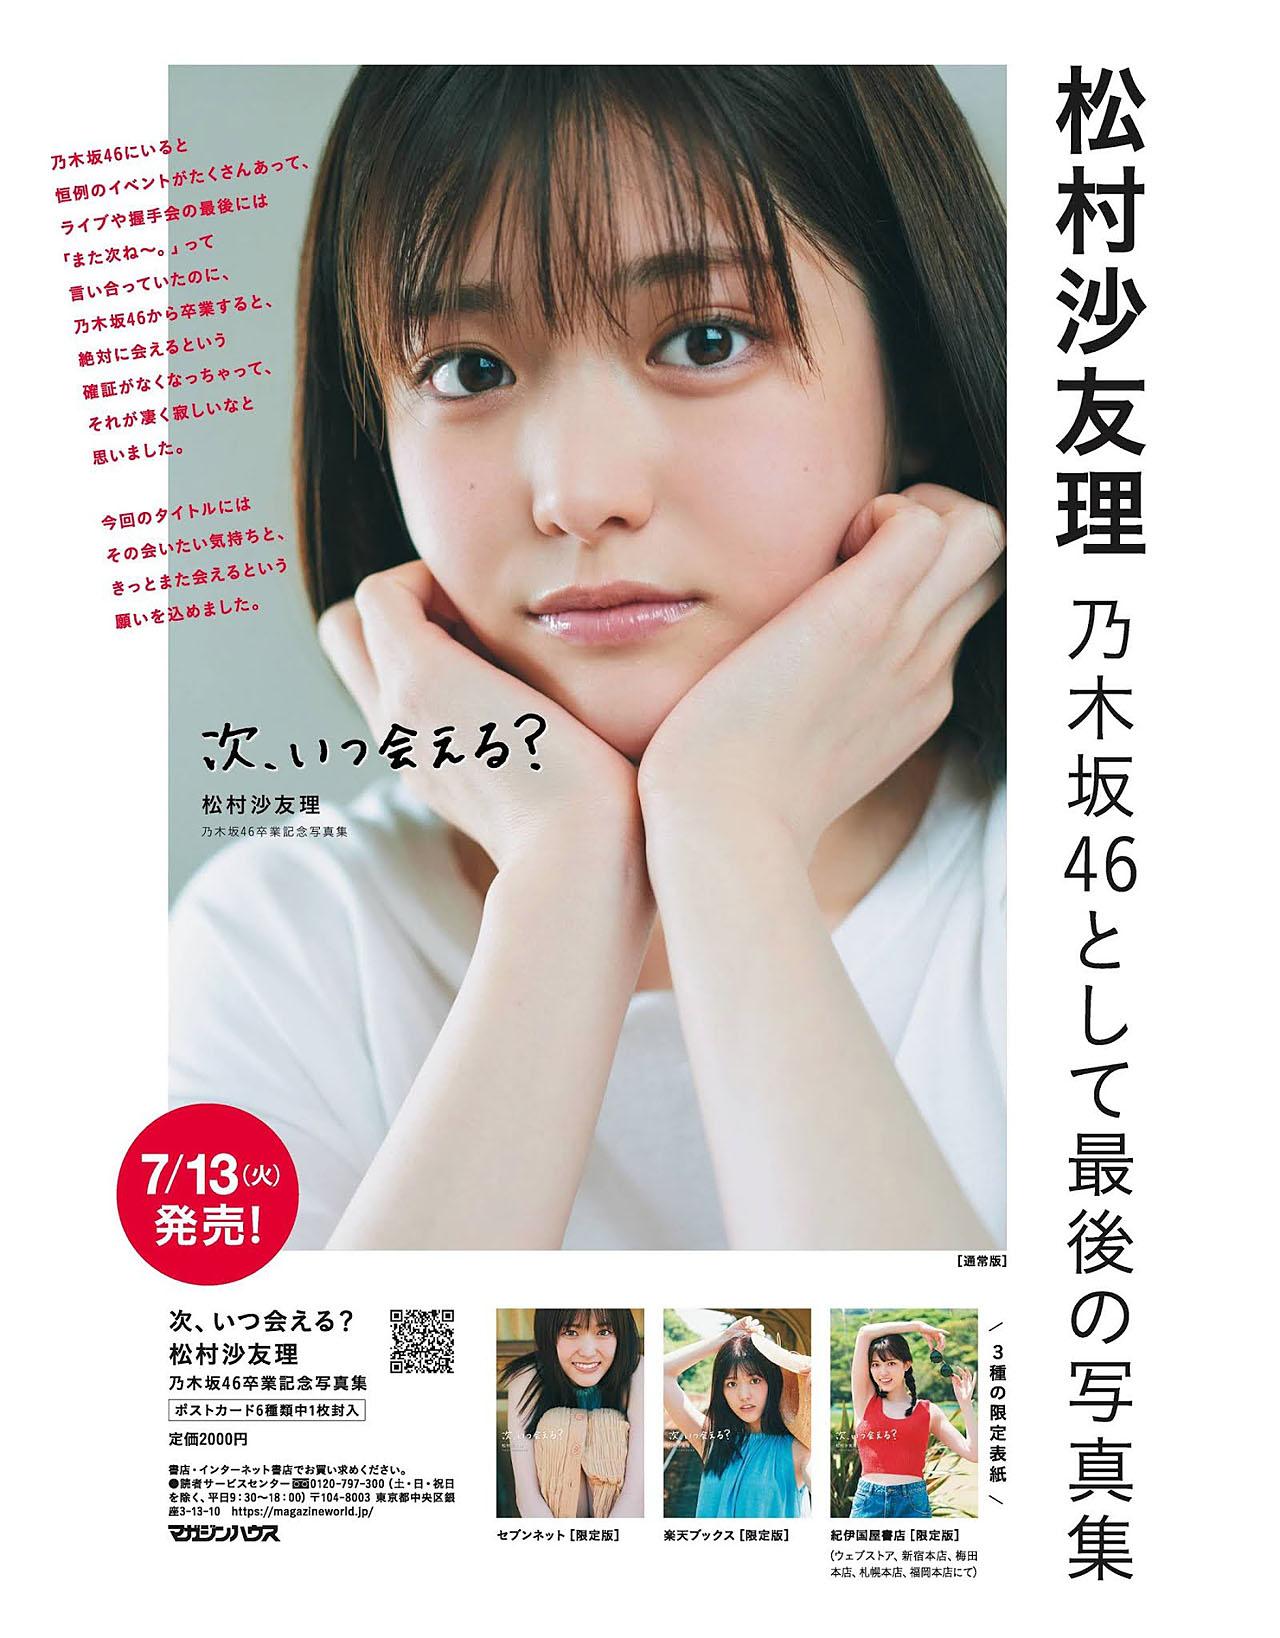 SMatsumura Anan 210630 11.jpg